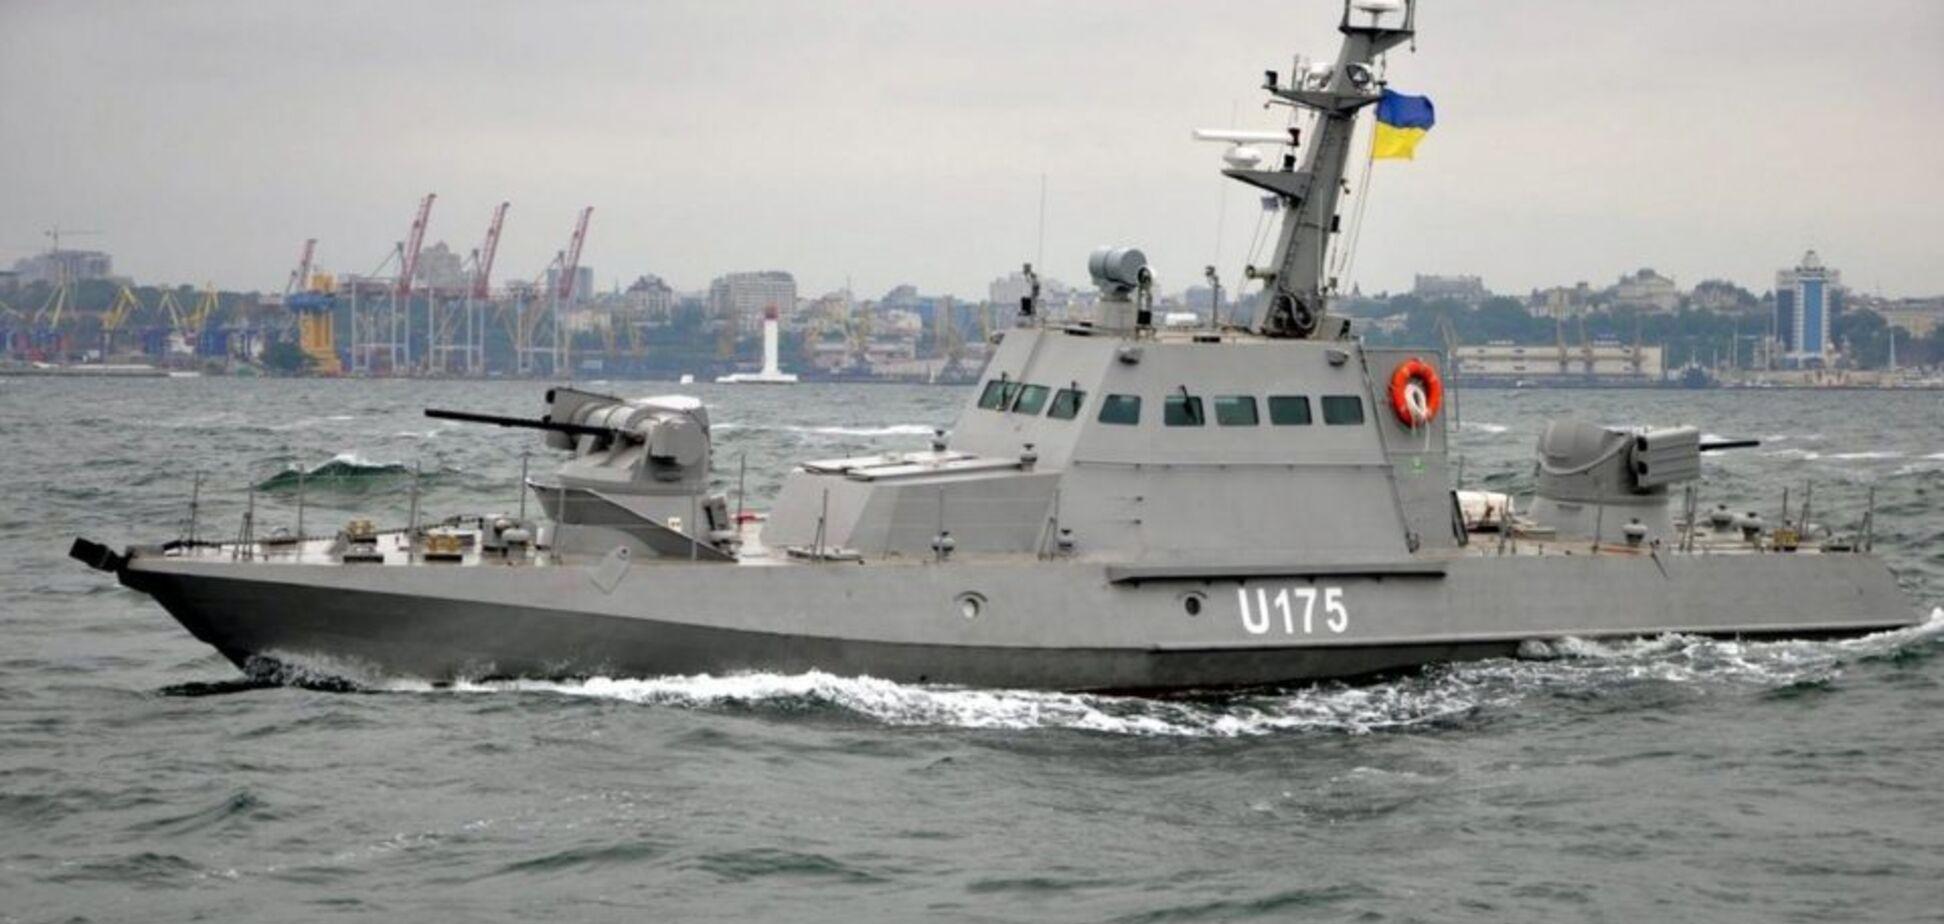 Оборона Азовського моря: Порошенко анонсував радикальні заходи